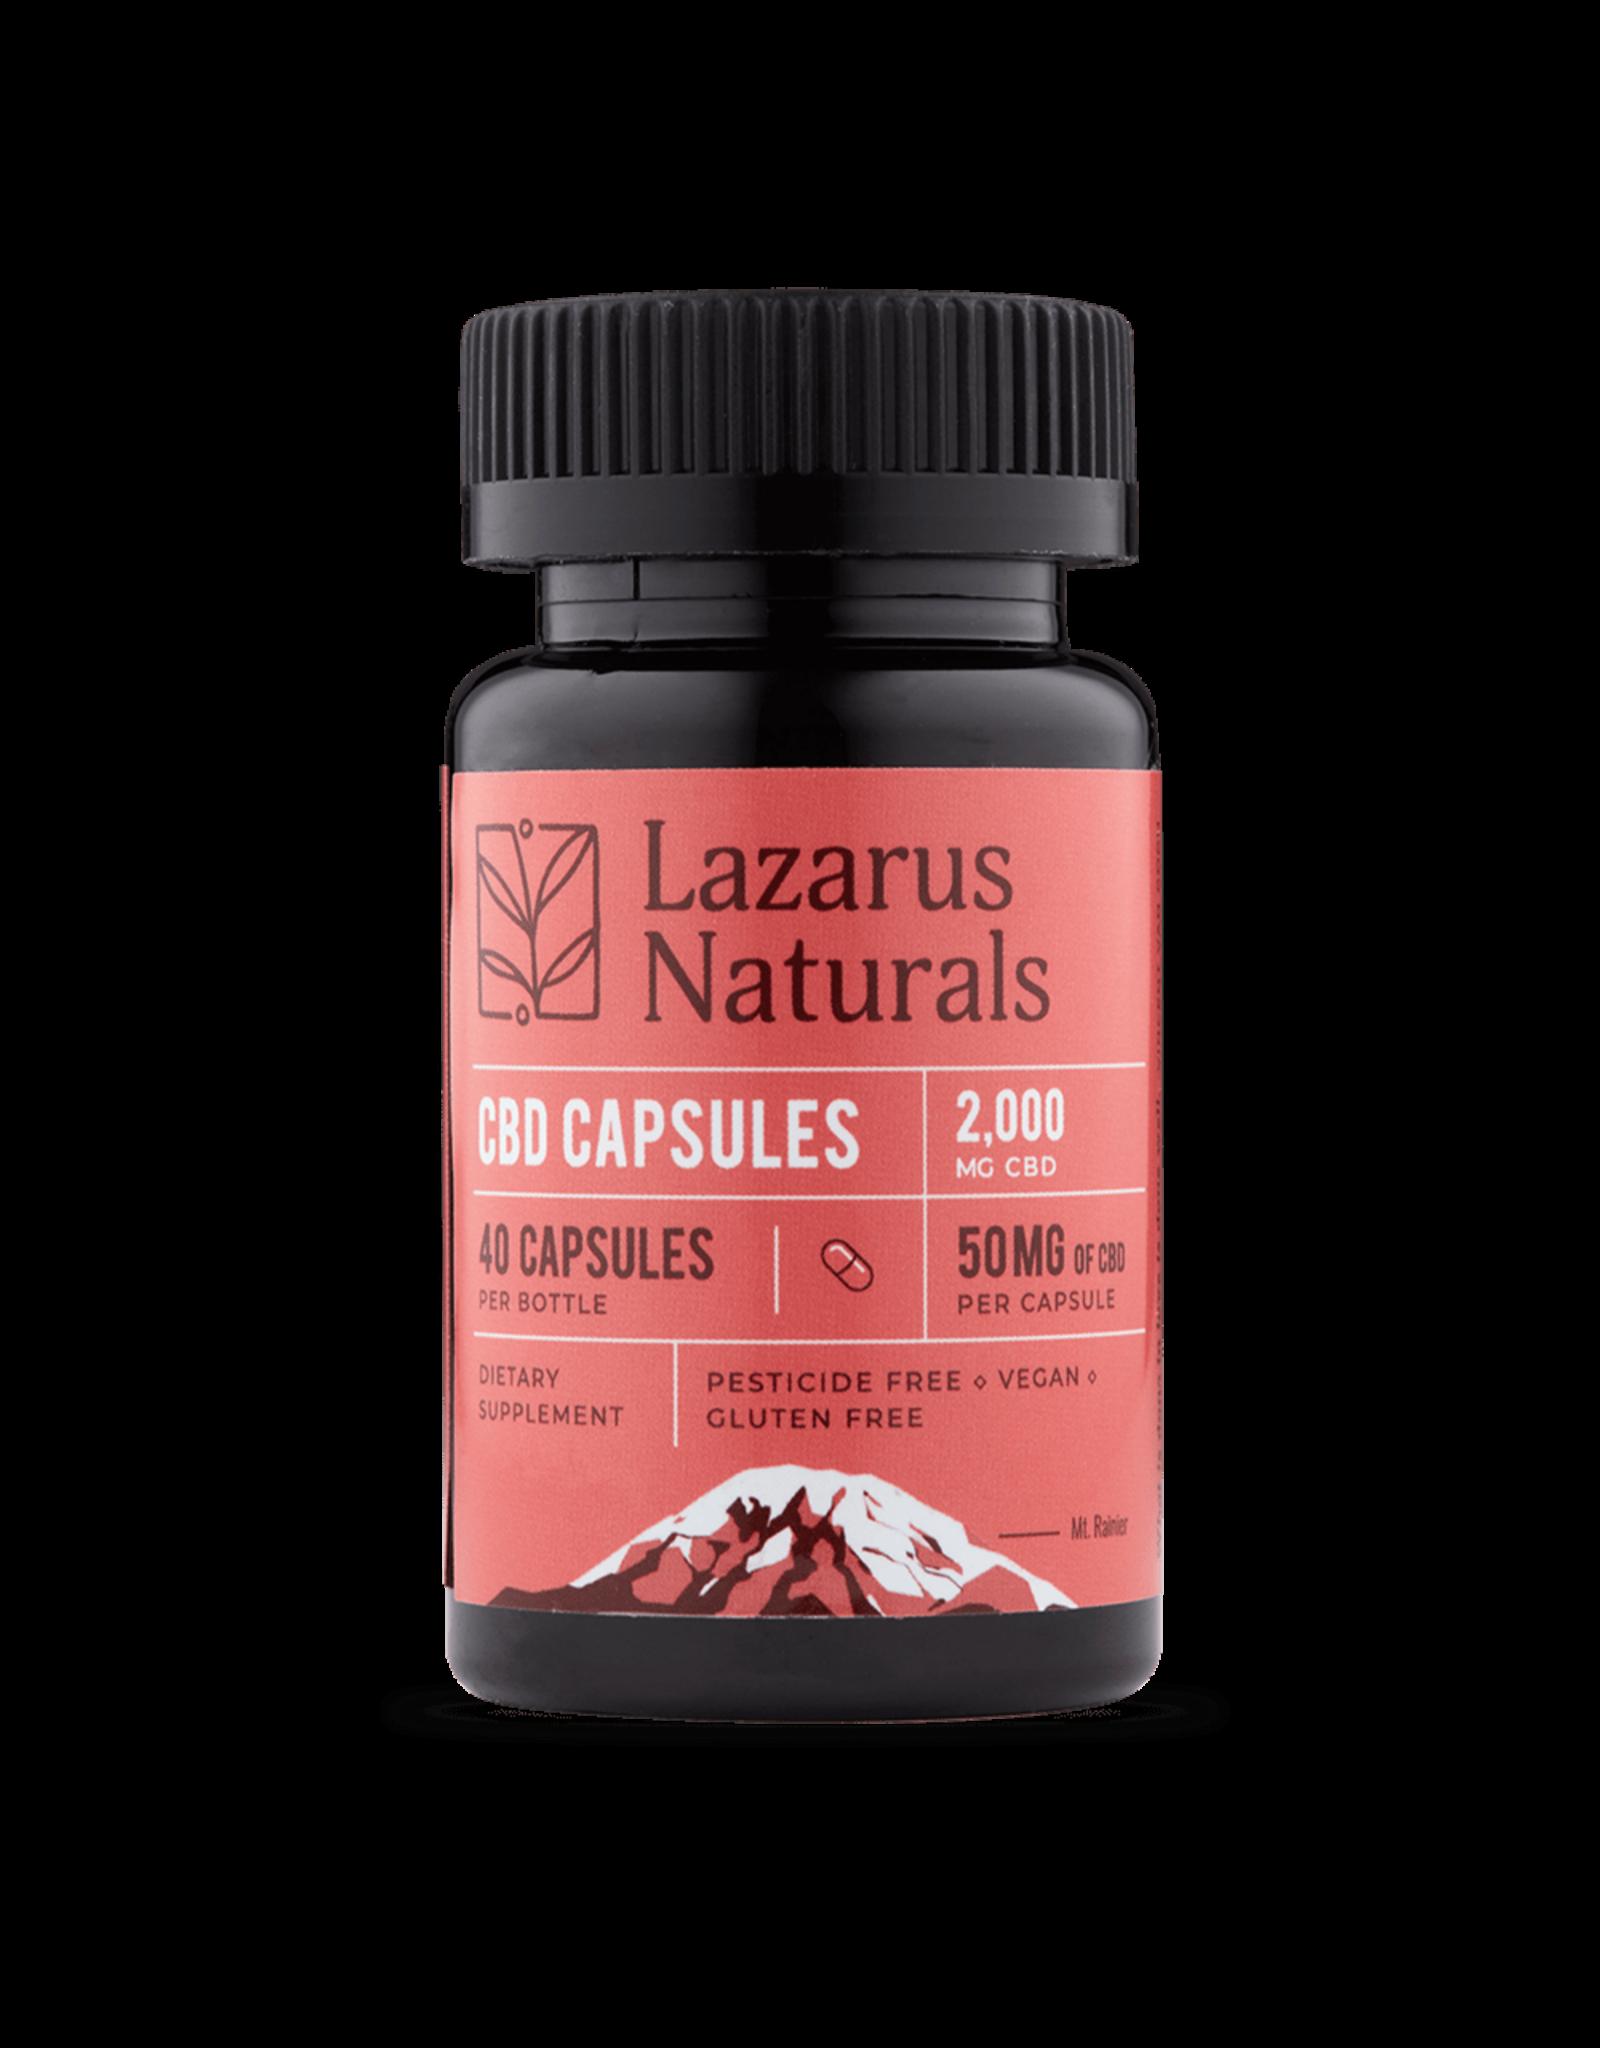 Lazarus Naturals Lazarus Naturals 50mg 40ct CBD Capsules